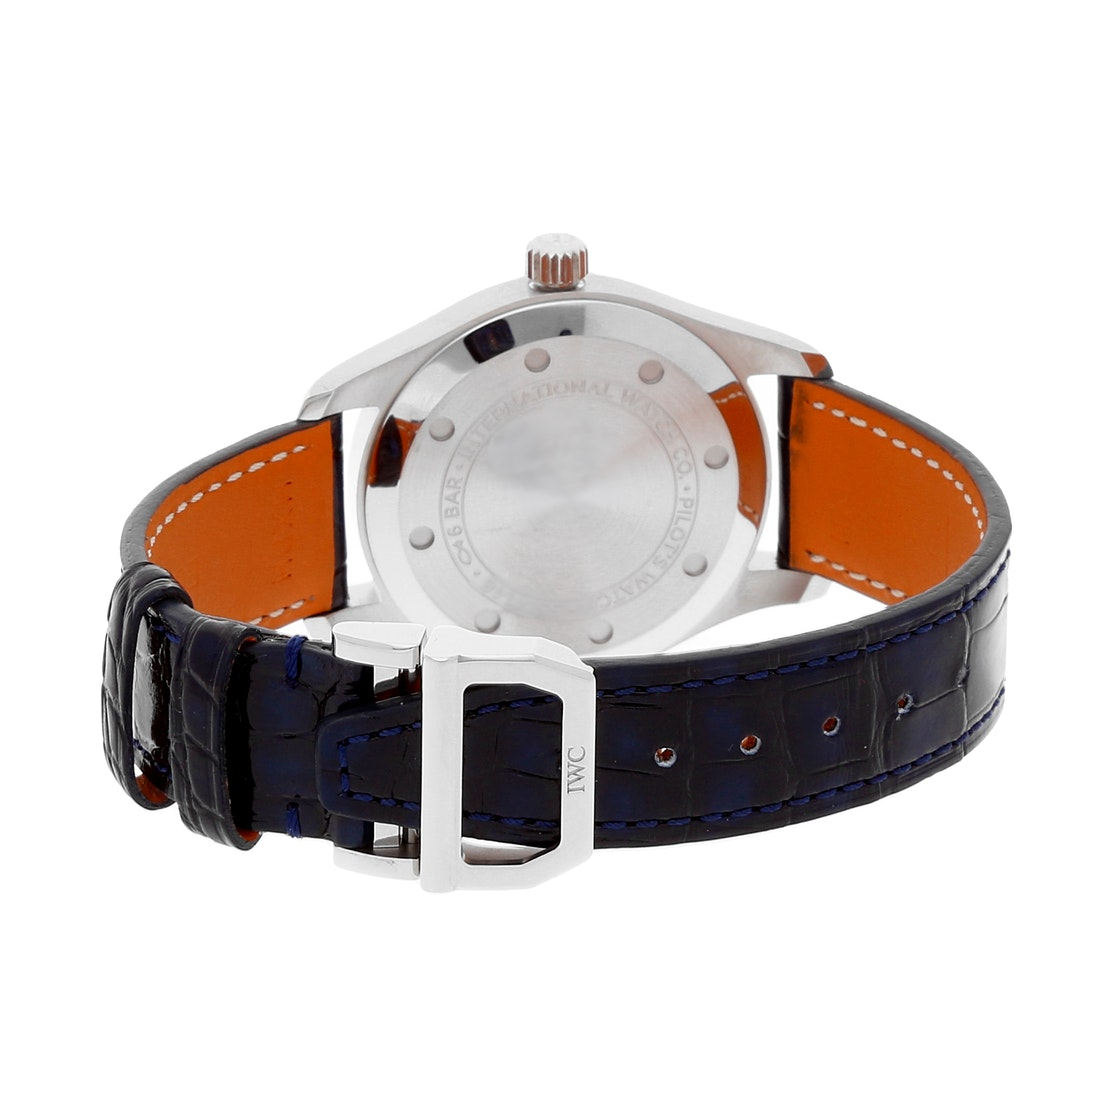 IWC Pilot's Watch IW3240-08